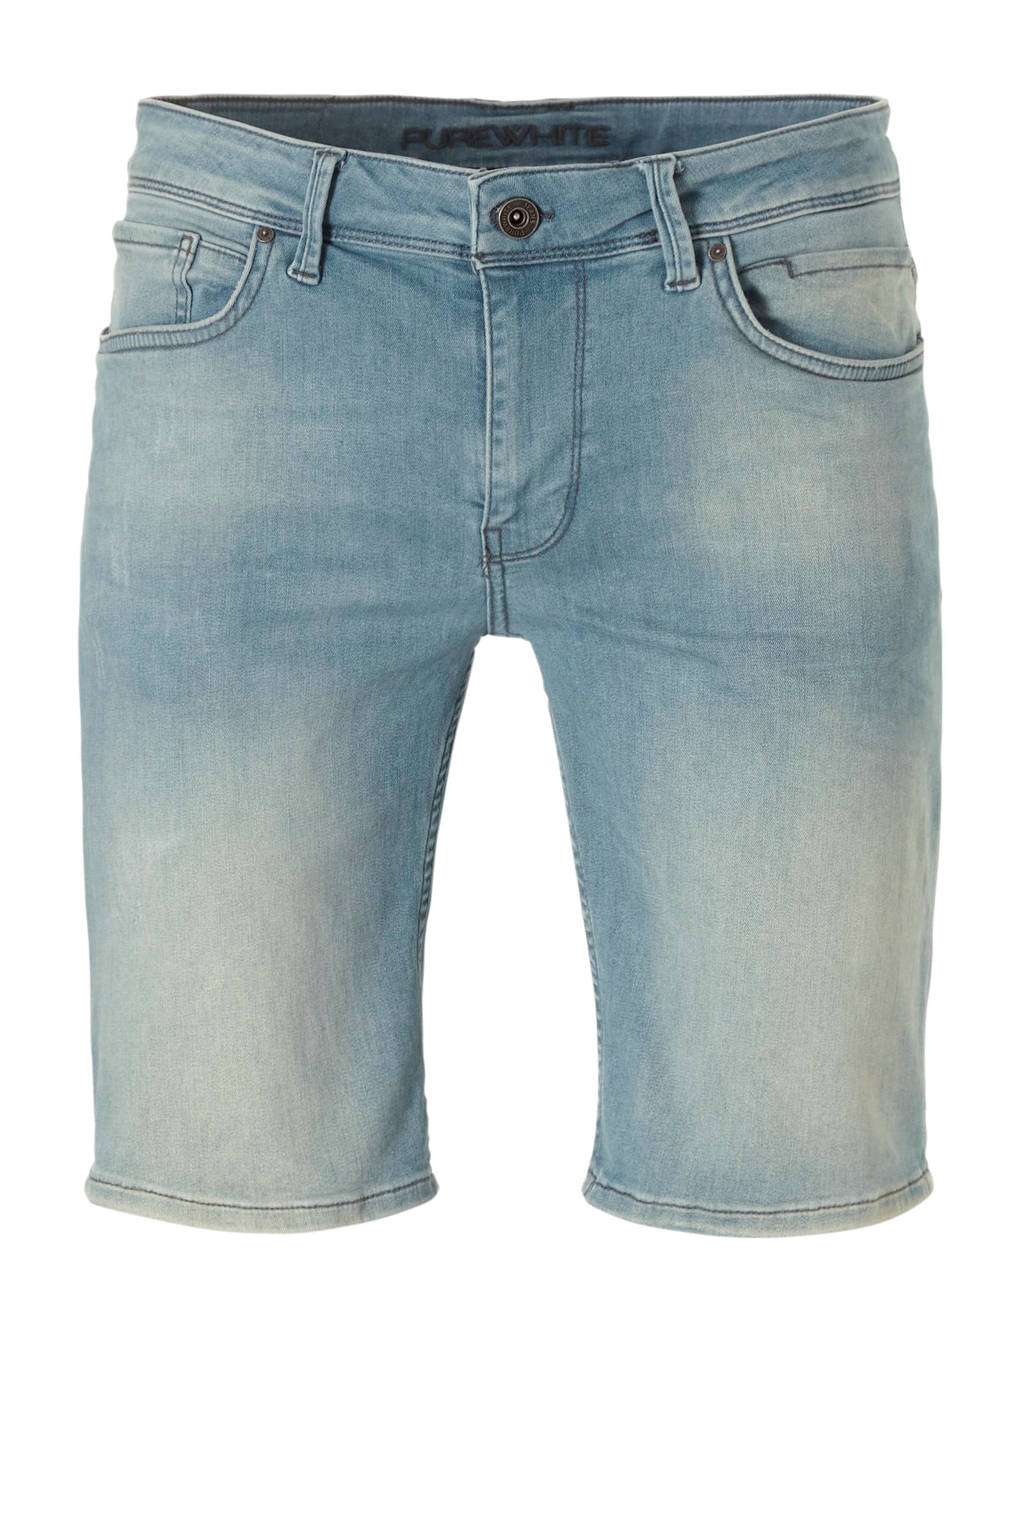 Purewhite slim fit jeans short The Steve, blue